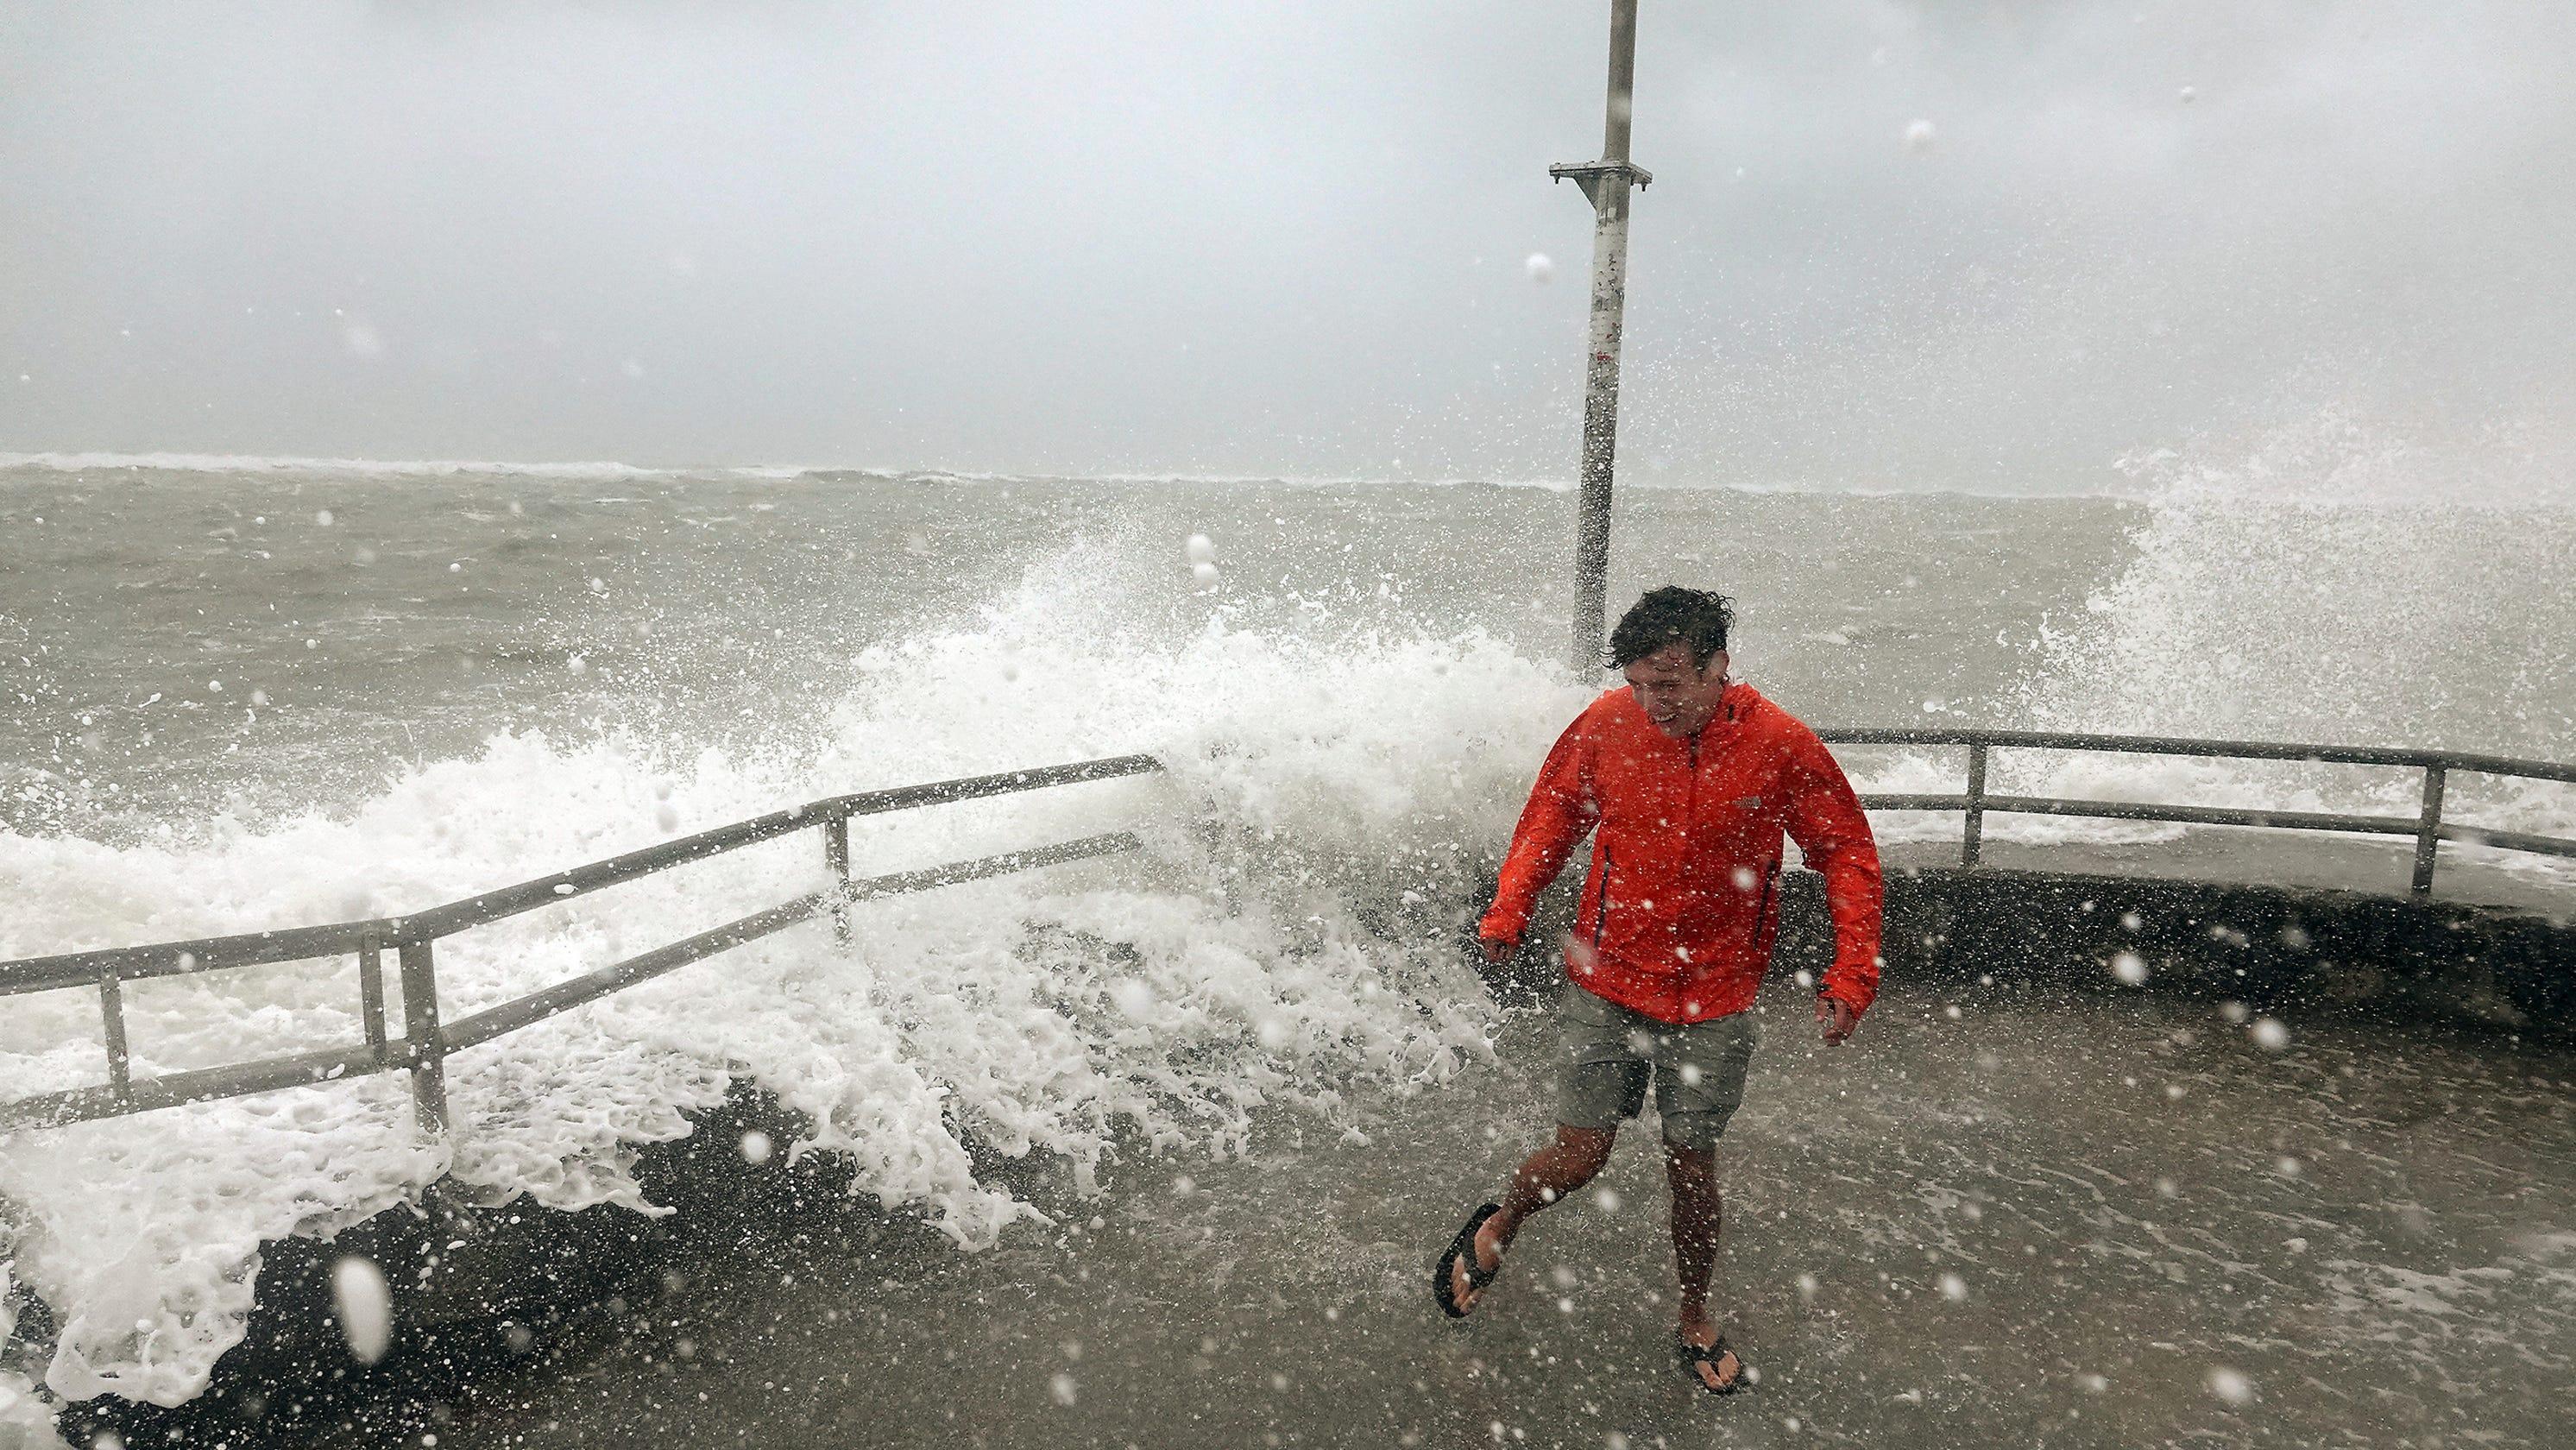 Westlake Legal Group 97858bfa-e57e-4448-8044-4cfa8604c814-florida_storm As Hurricane Dorian rolls toward the Carolinas, 1 million people ordered to evacuate